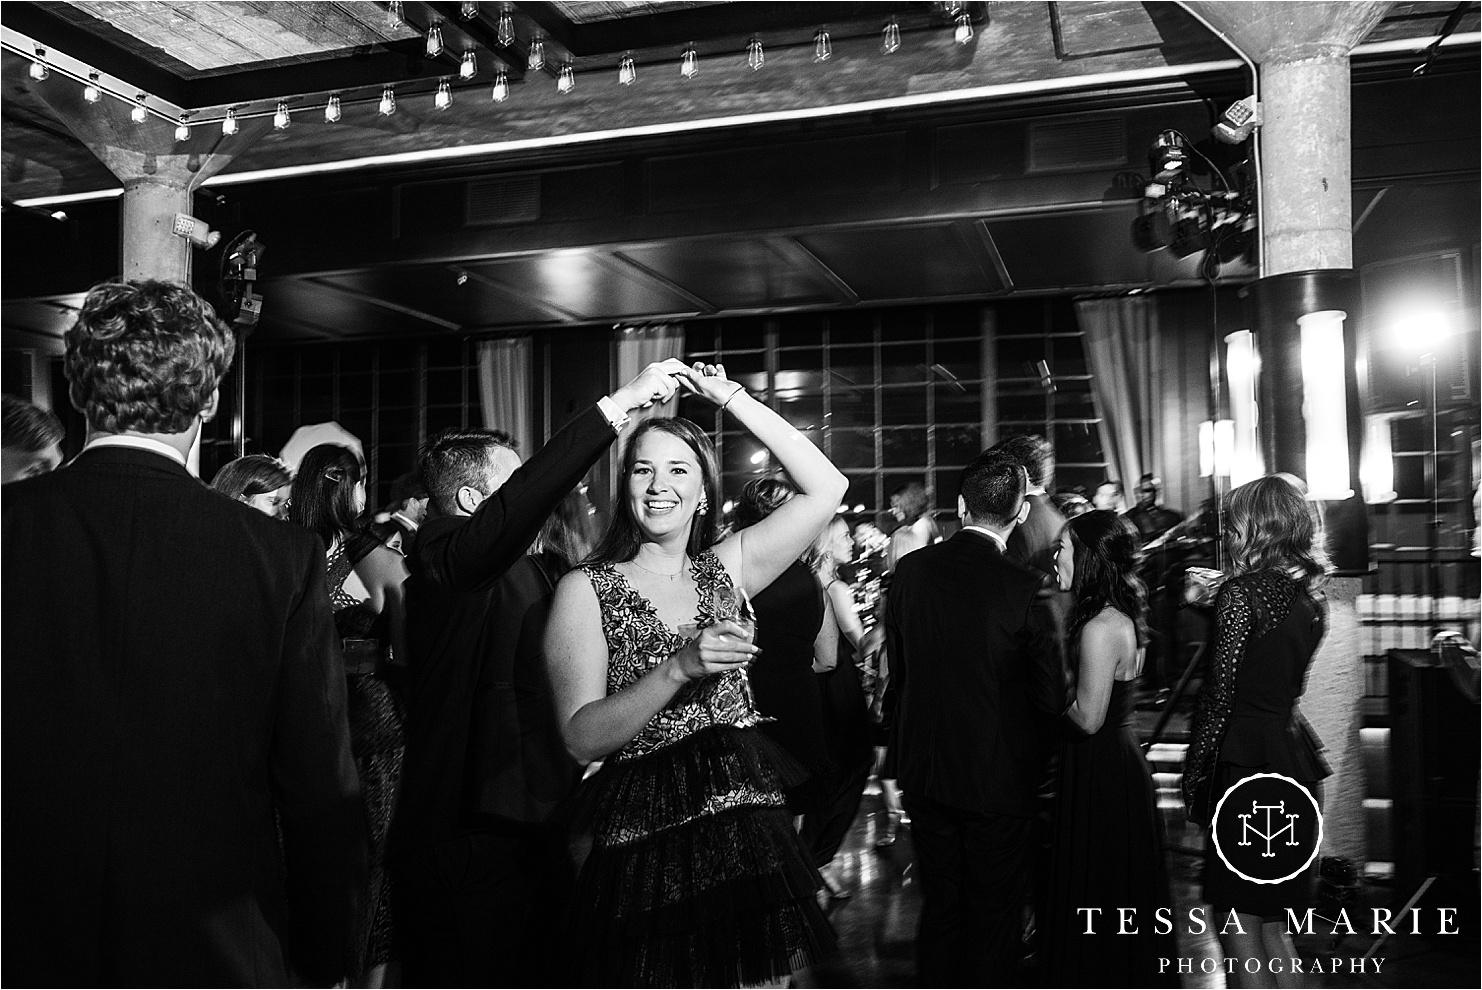 Tessa_marie_weddings_houston_wedding_photographer_The_astorian_0180.jpg